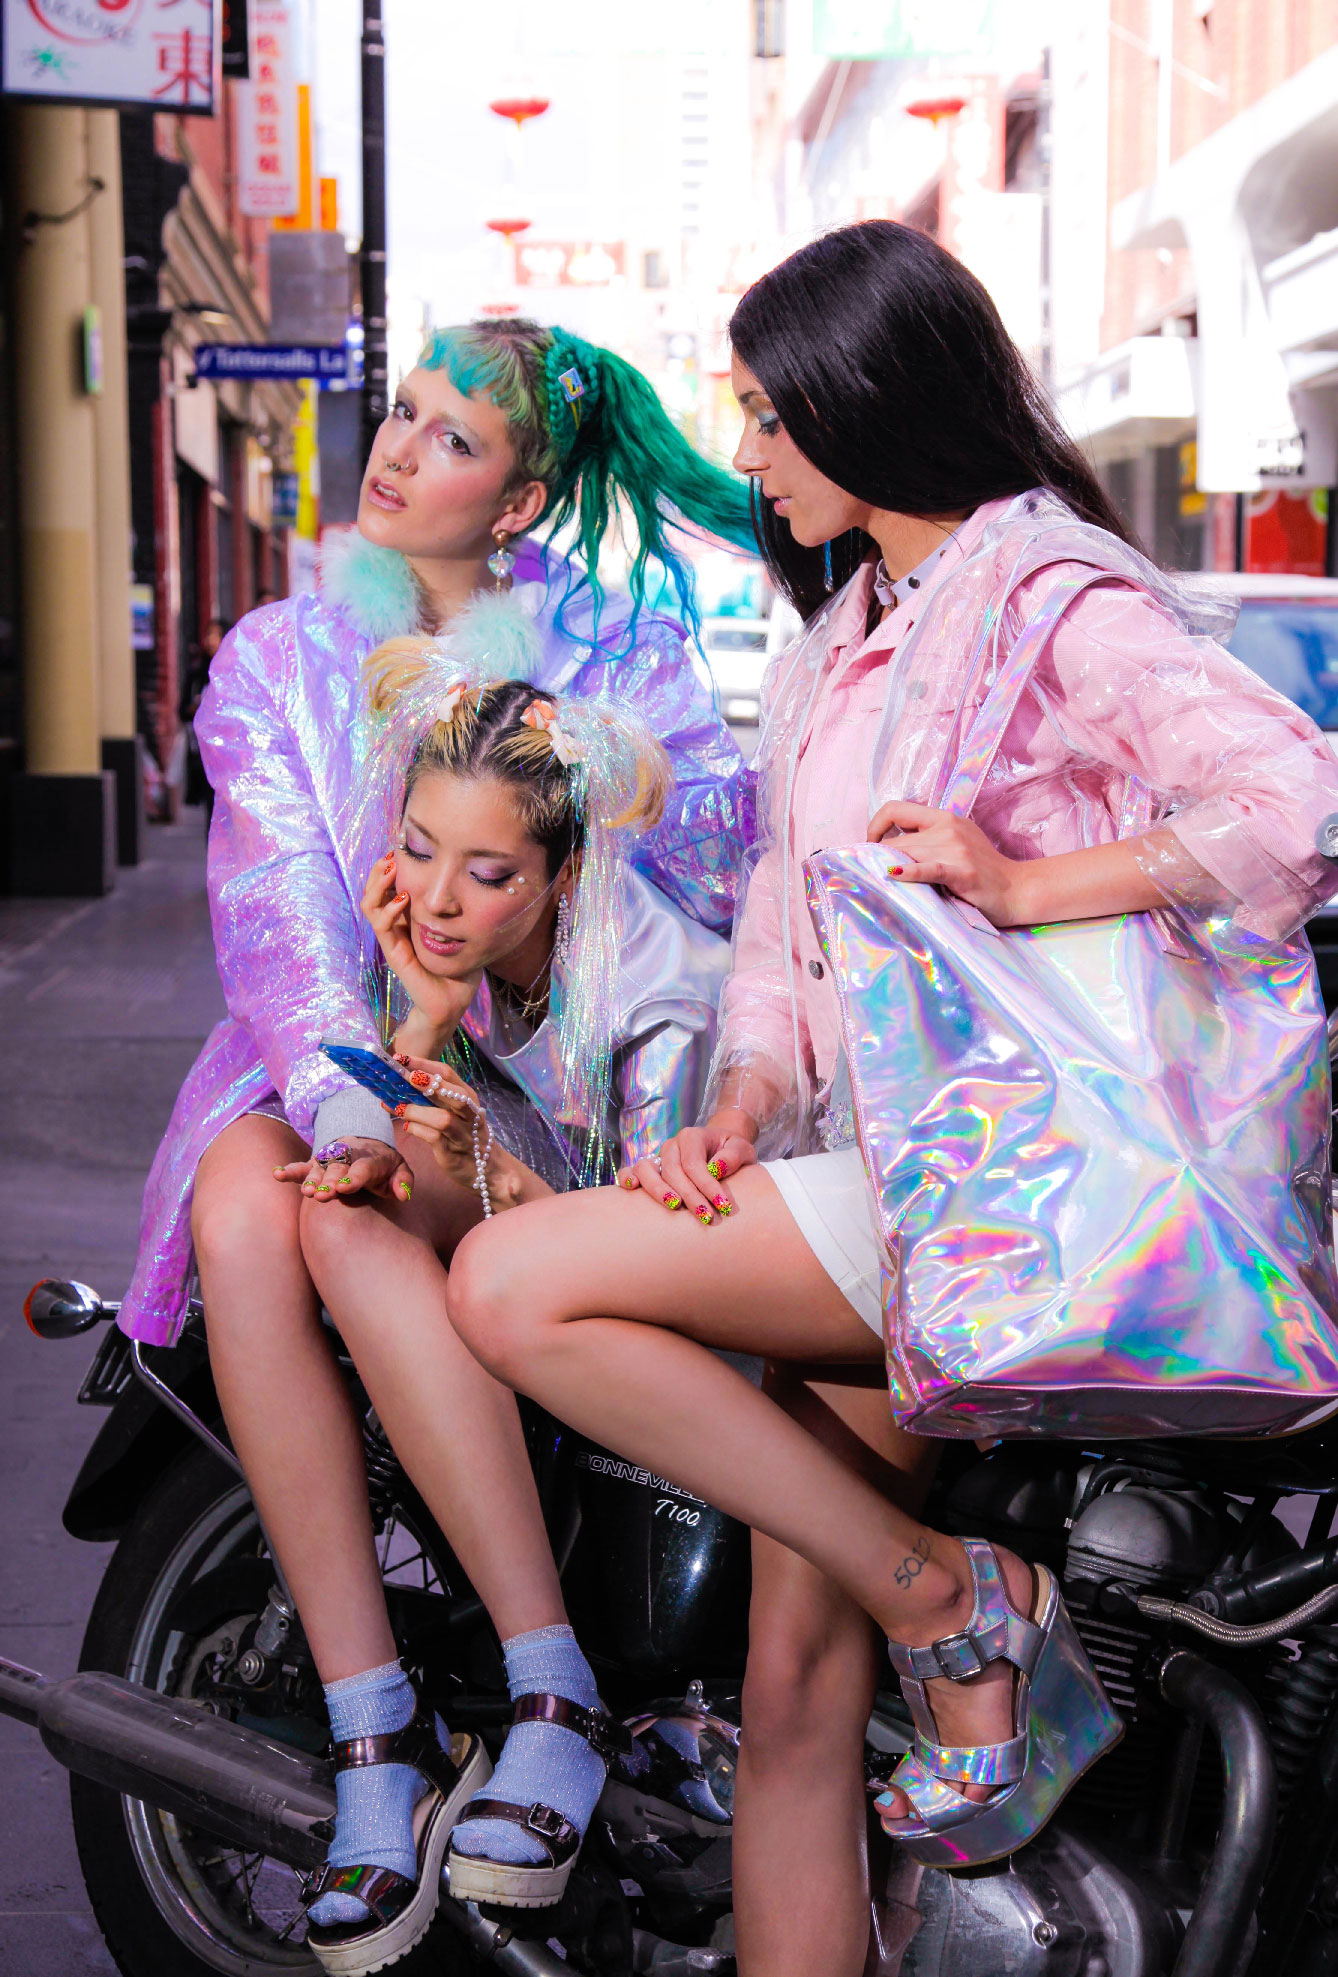 Girls Bike Scanning.jpg